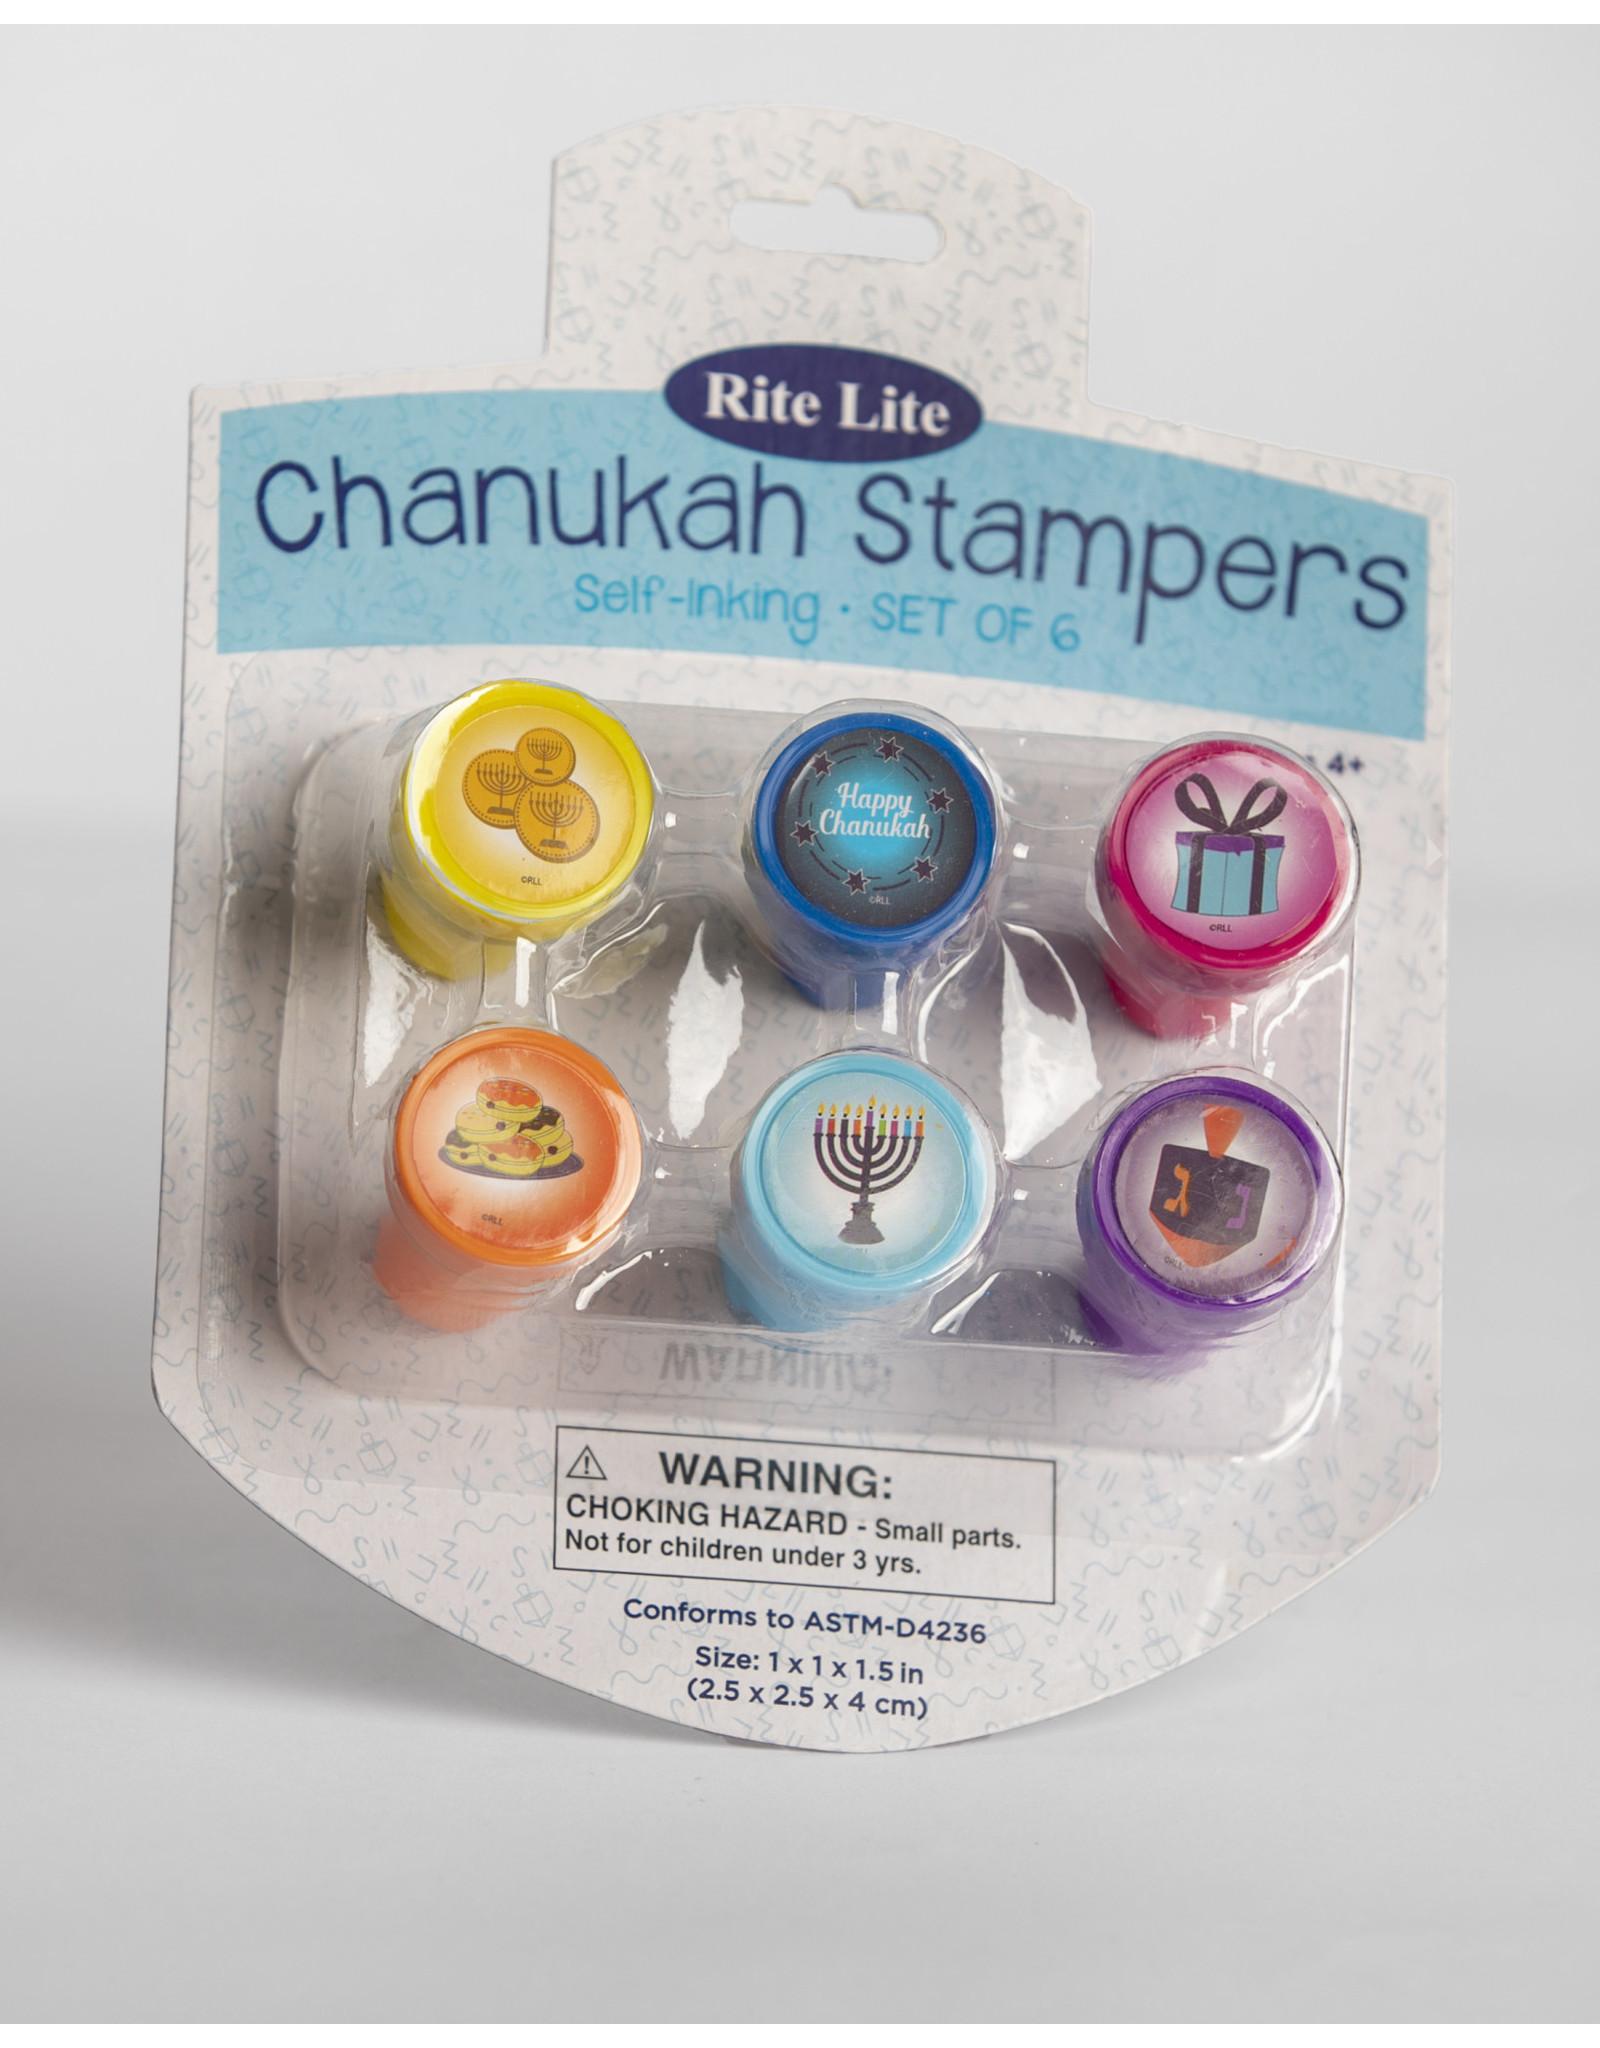 Rite Lite Chanukah Hanukkah Stampers